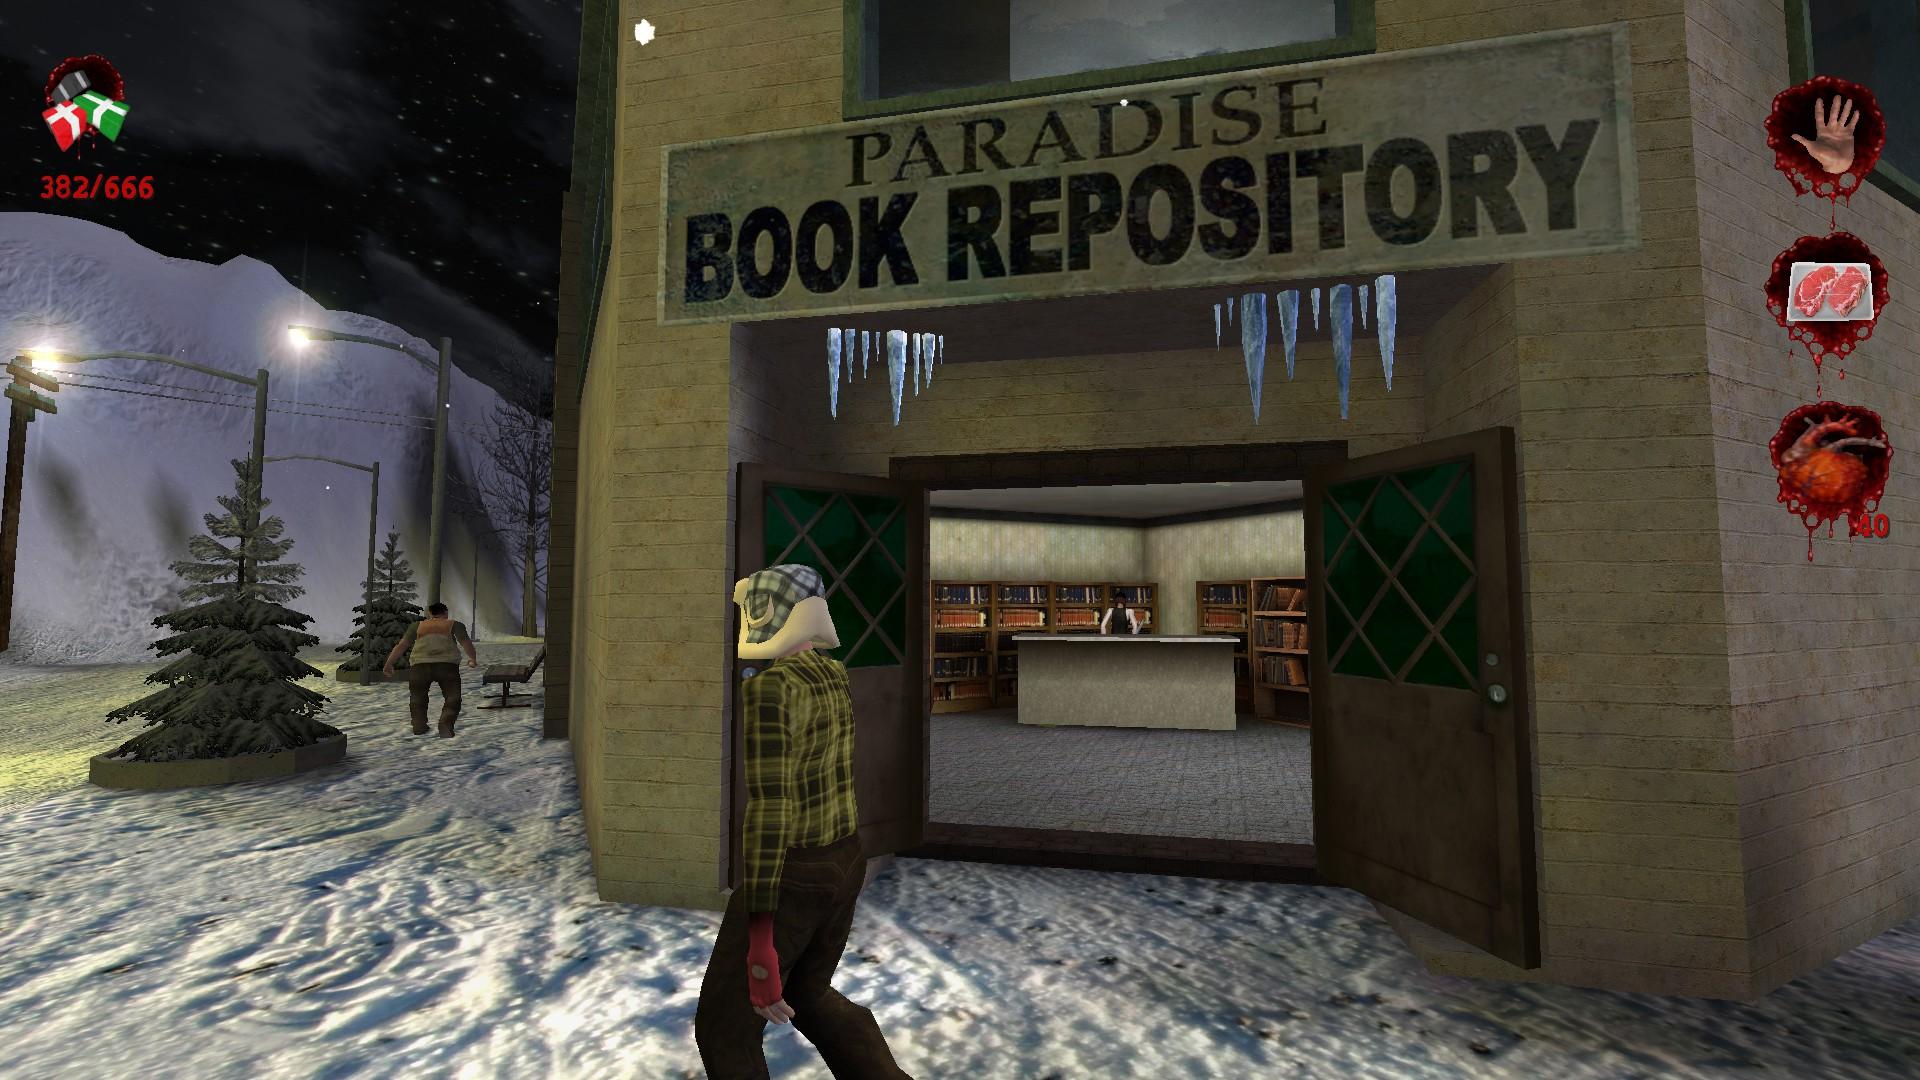 Book repository